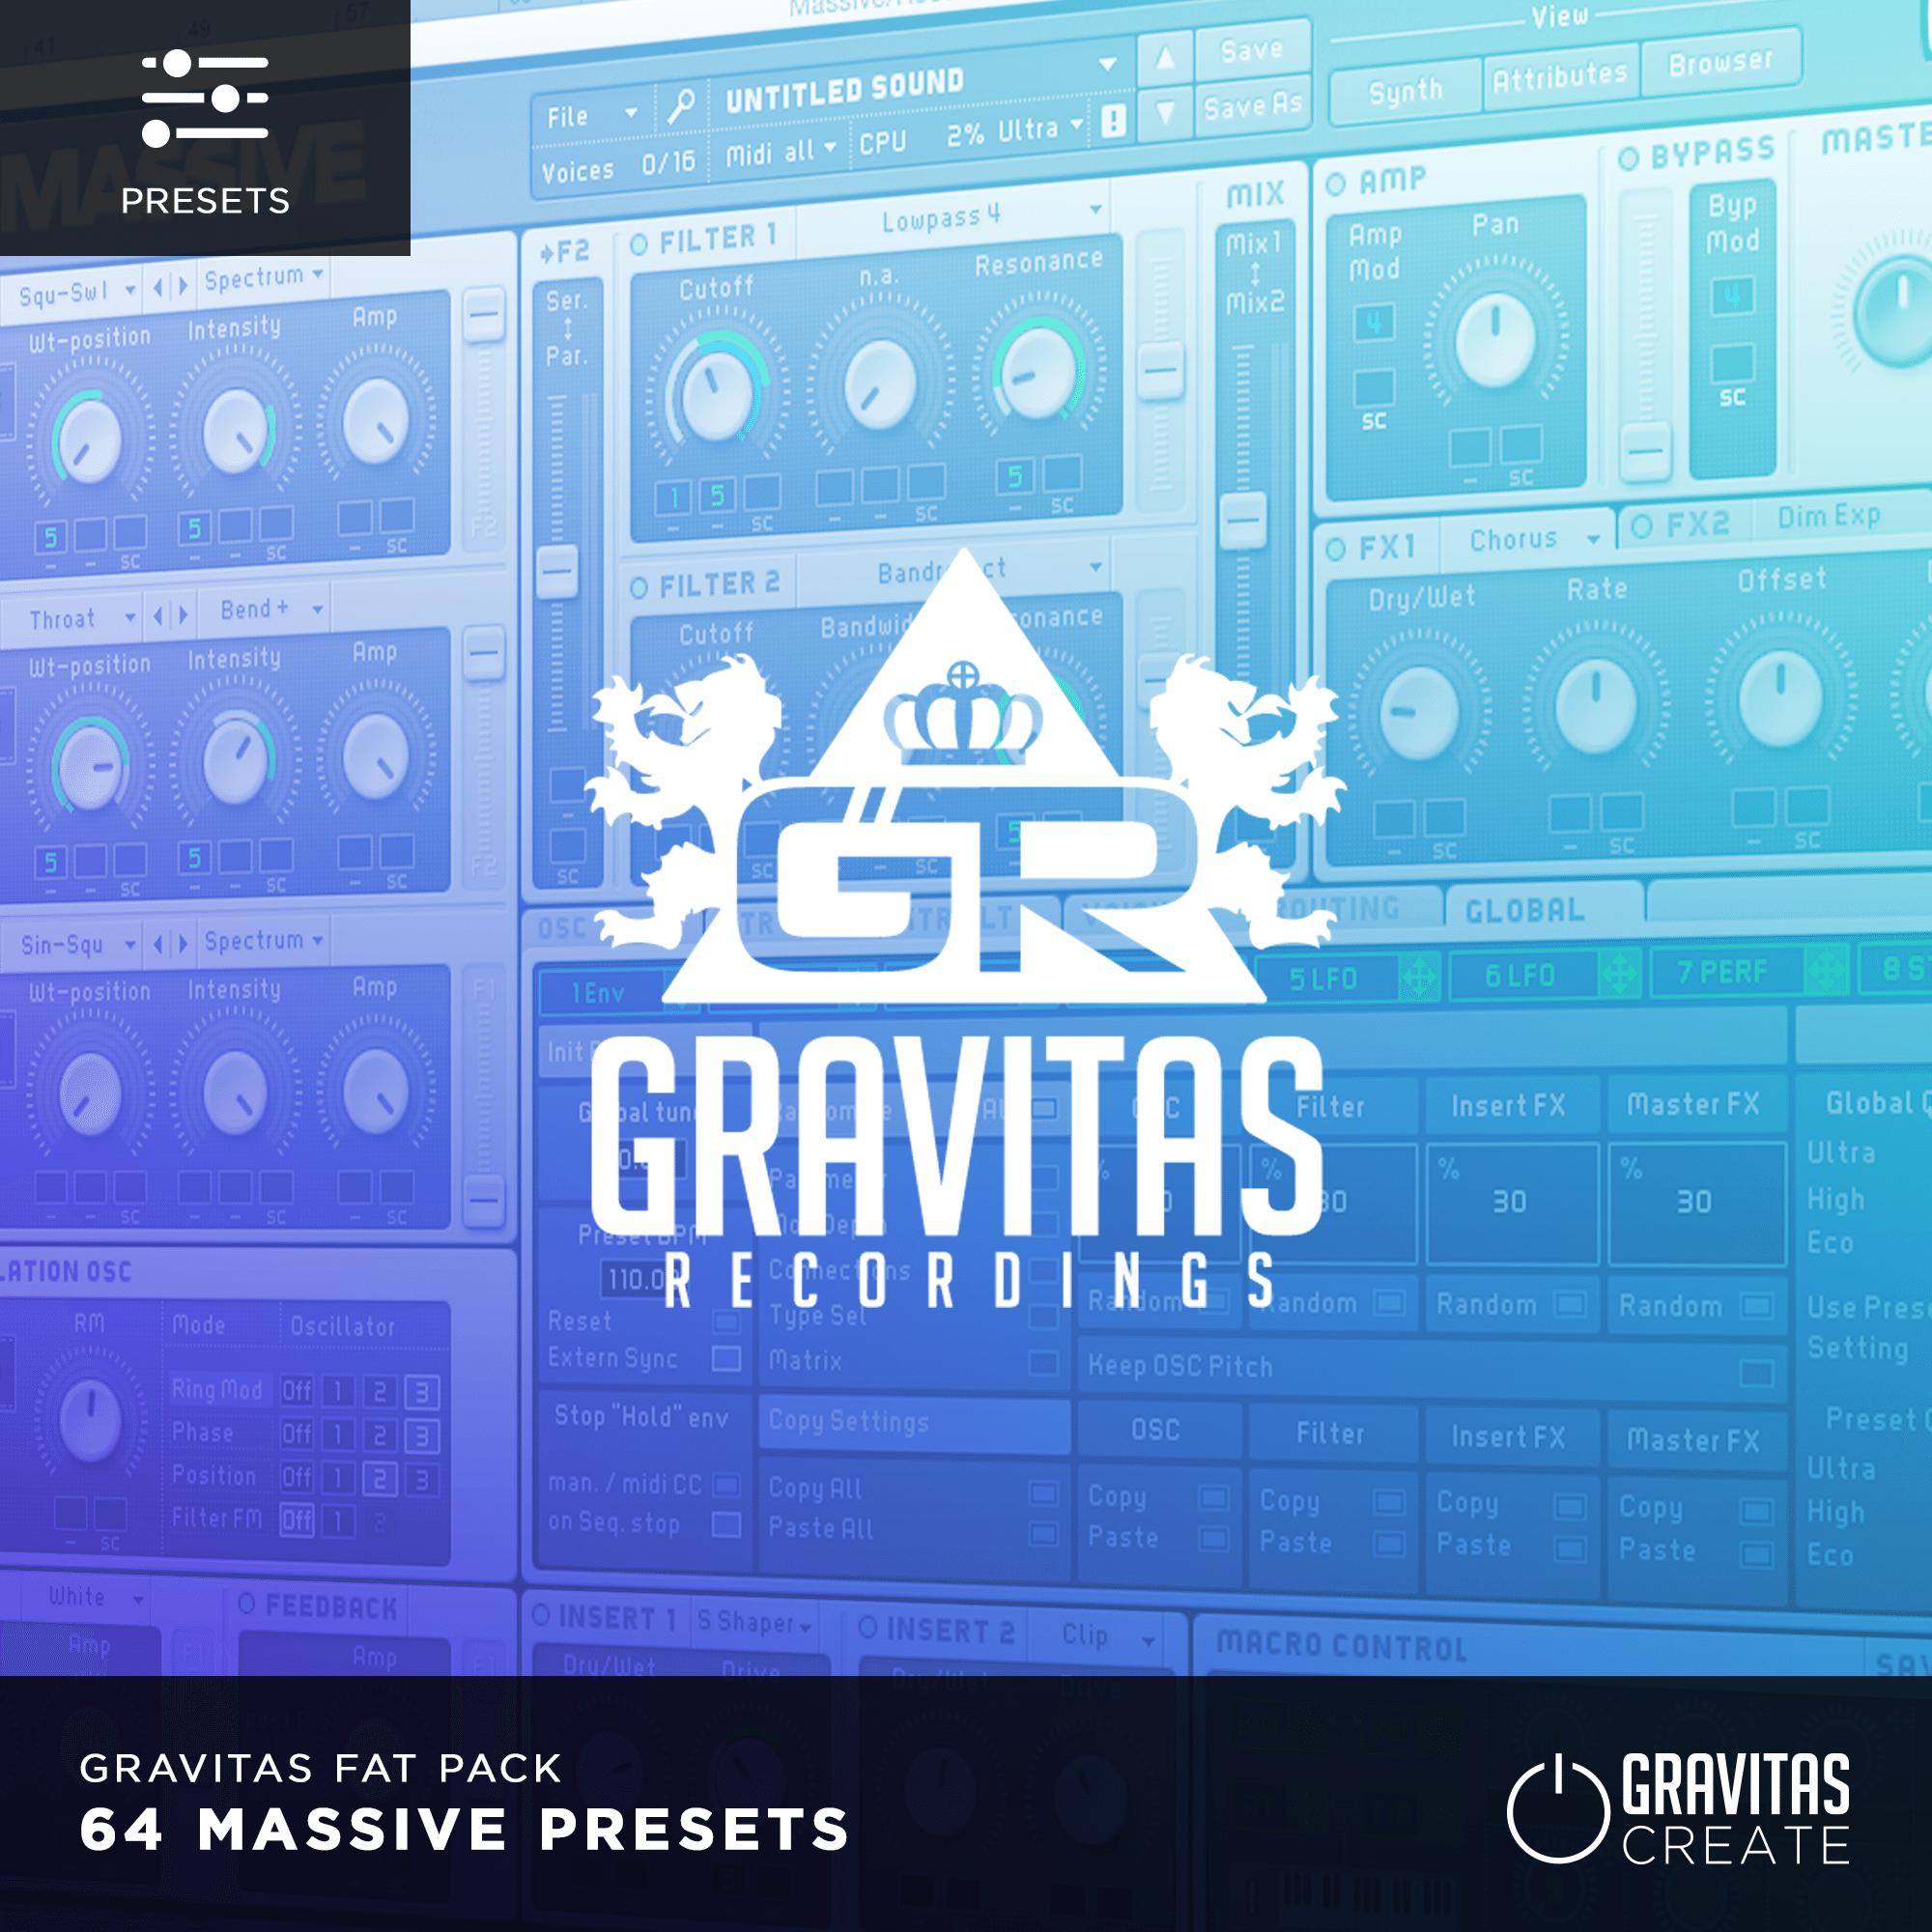 Gravitas Create